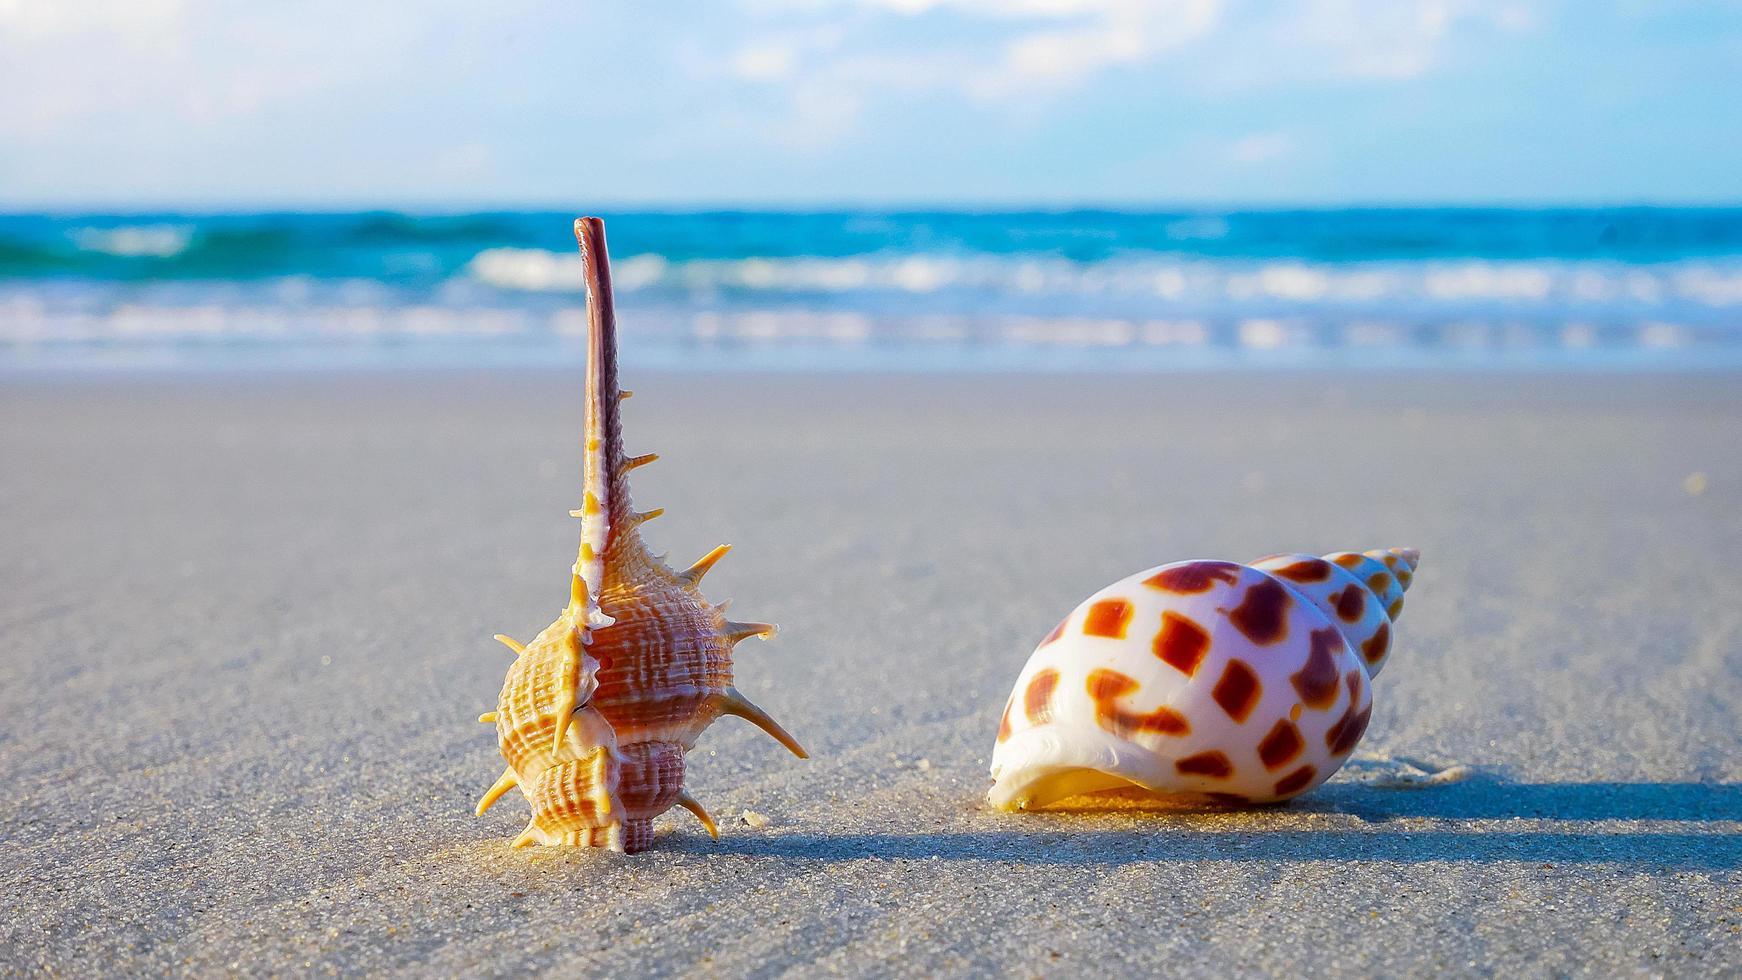 färgglada skal på stranden på sommaren foto